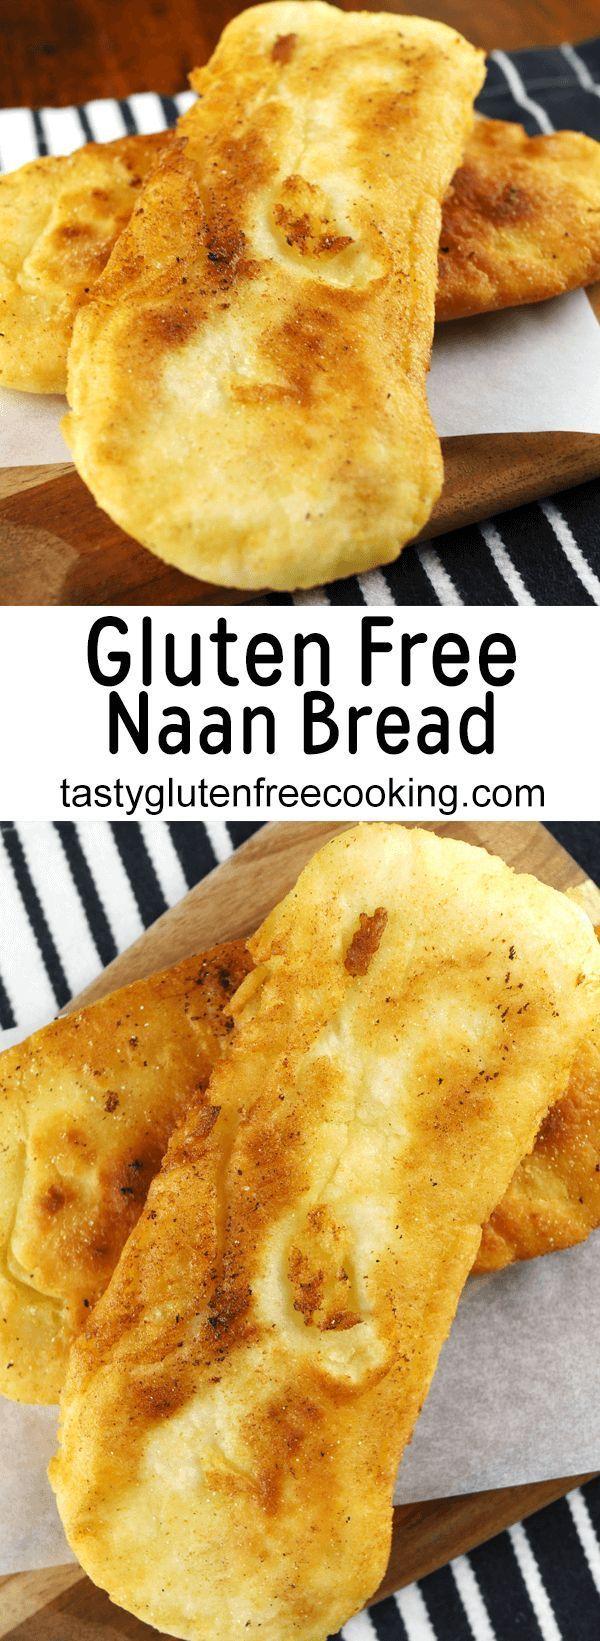 Gluten-Free Naan Bread #glutenfree